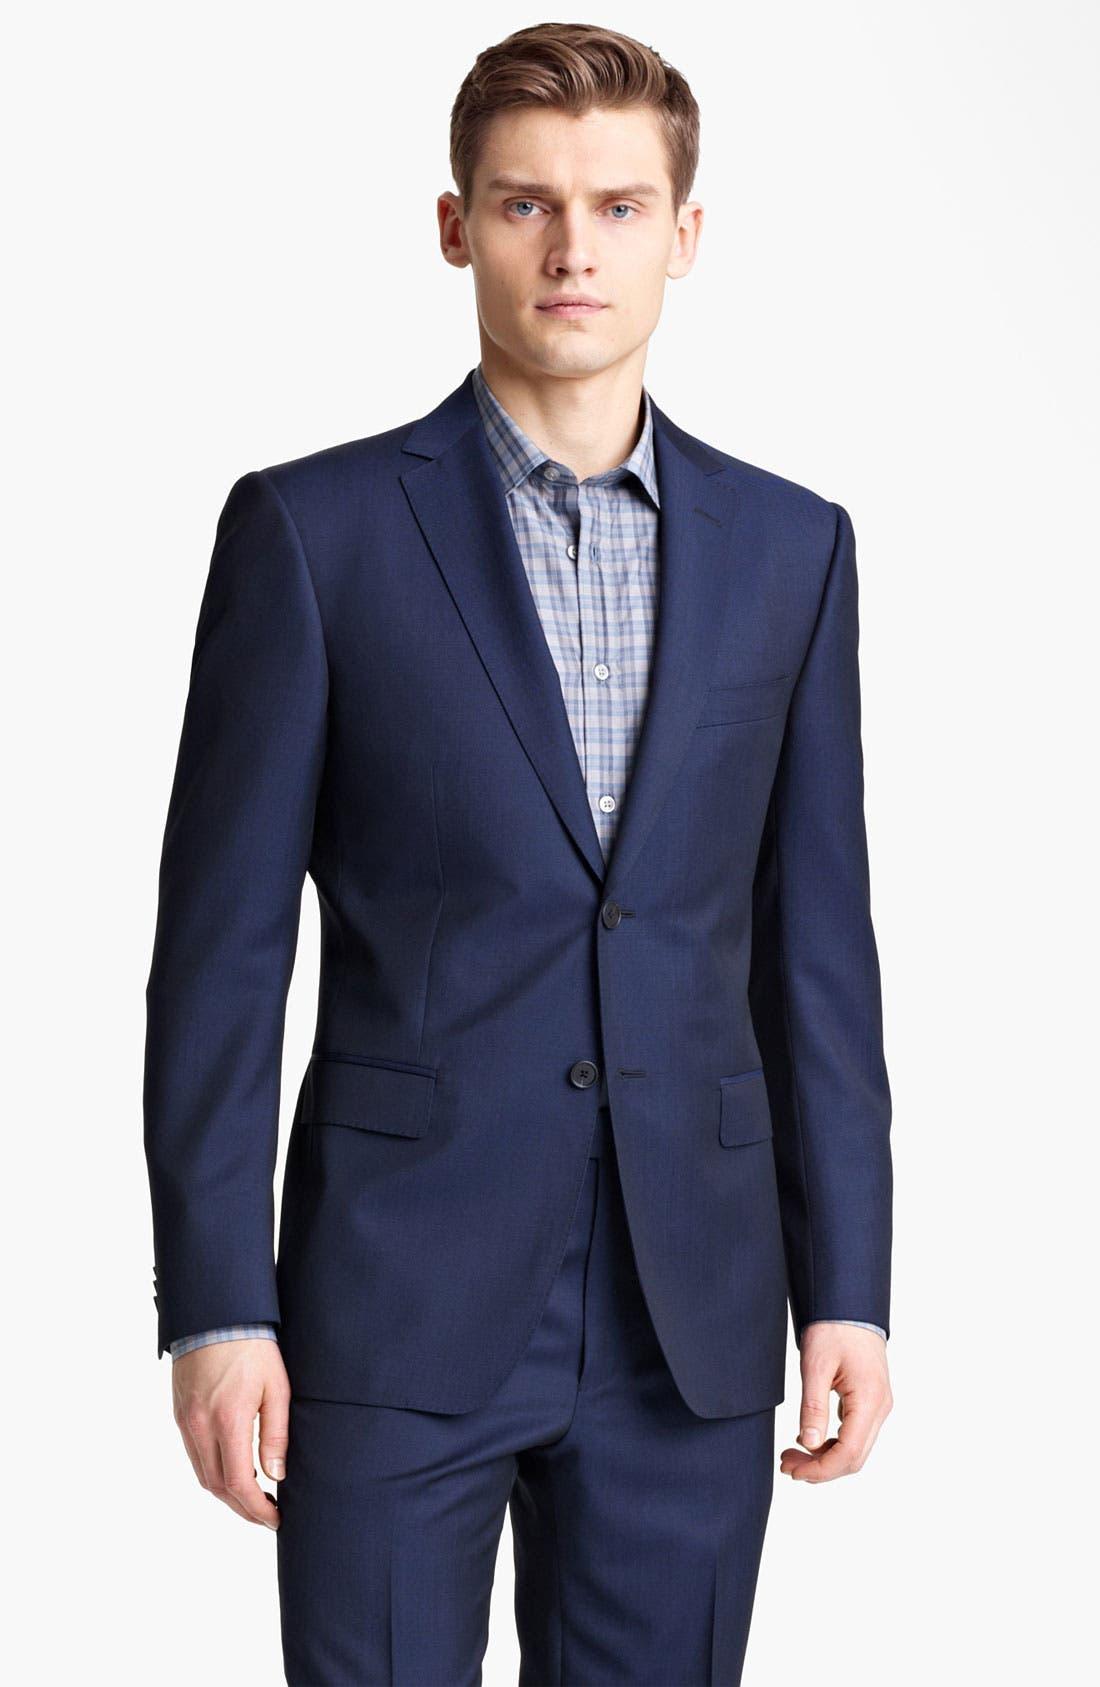 Alternate Image 1 Selected - Z Zegna Trim Fit Wool Blend Suit